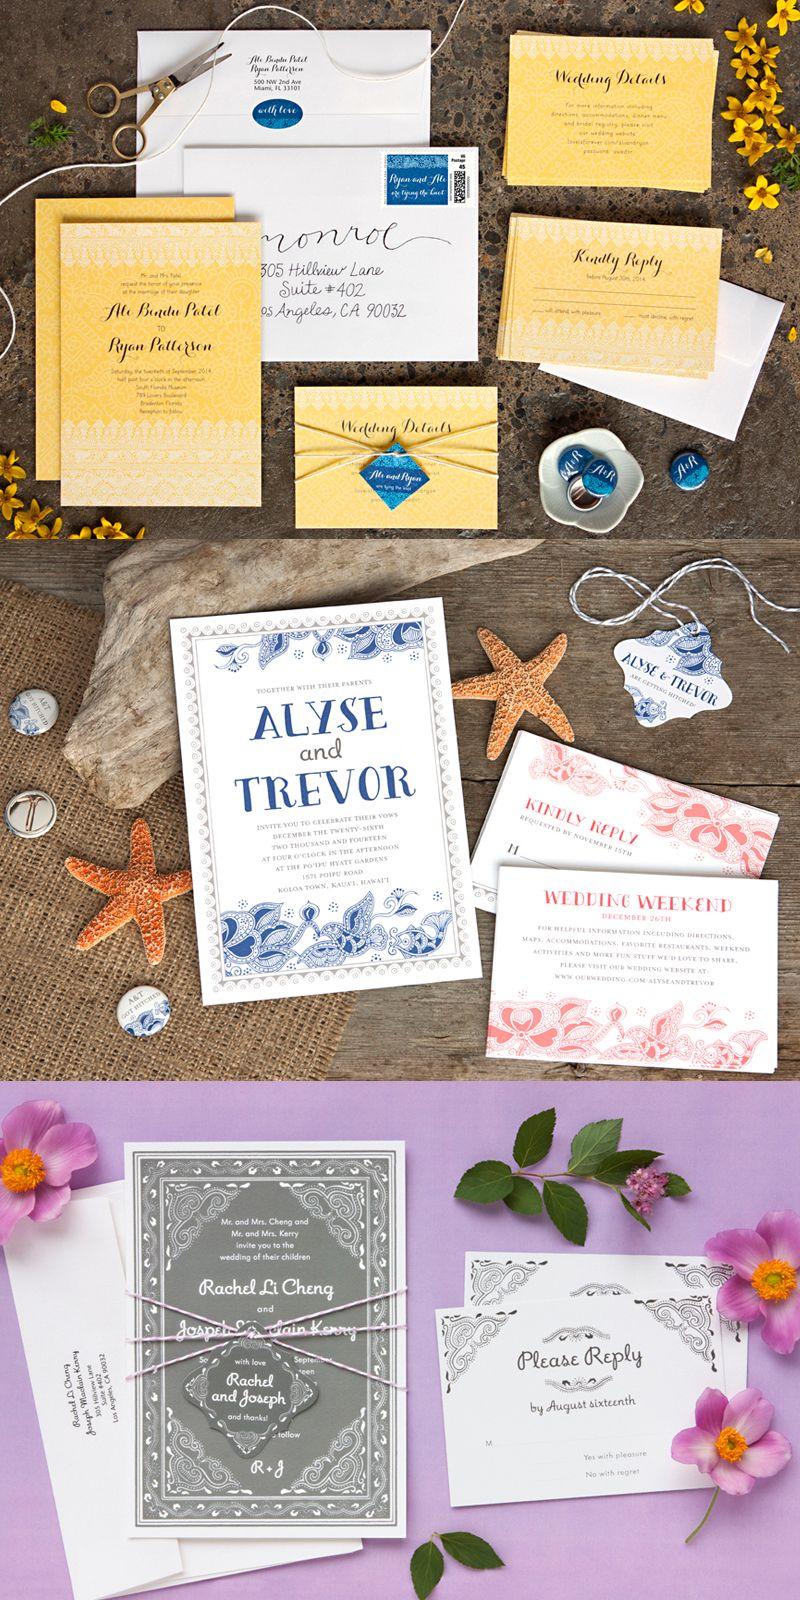 40+ Beautiful Wedding Invitations Cards & Kit Ideas | Pinterest ...